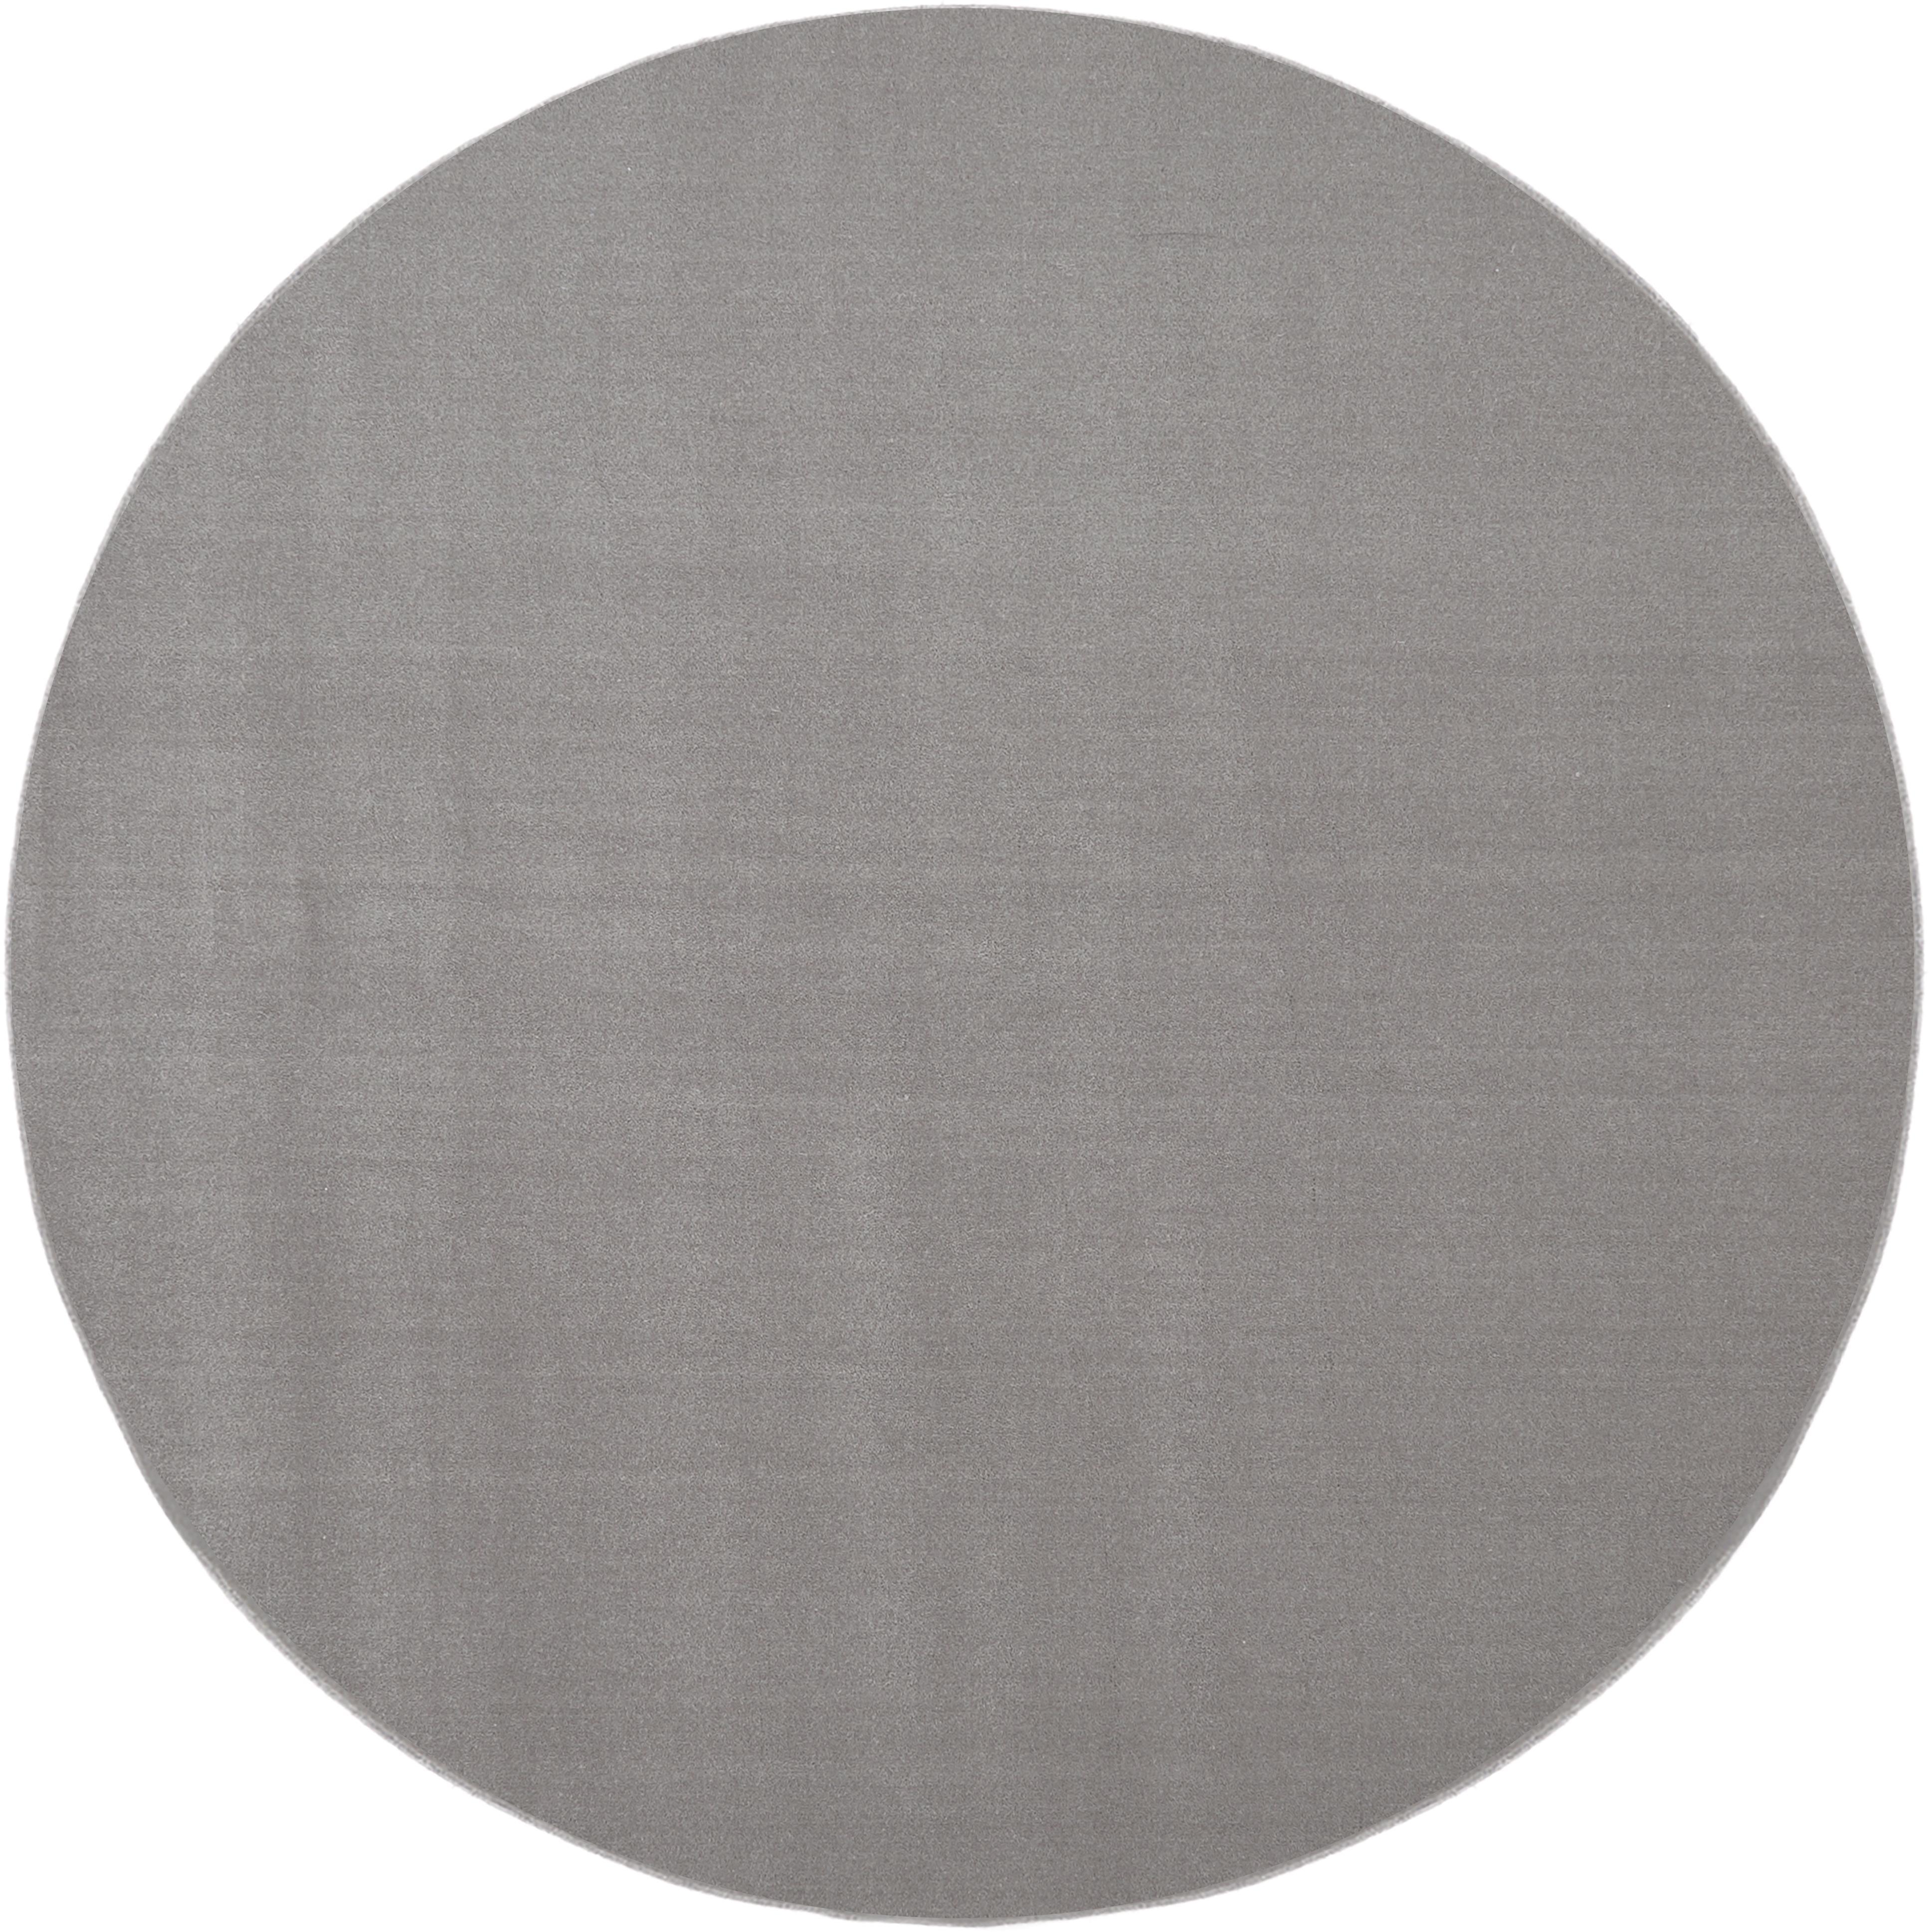 Alfombra redonda de lana Ida, Parte superior: lana, Reverso: 60%yute, 40%poliéster, Gris, Ø 120 cm (Tamaño S)